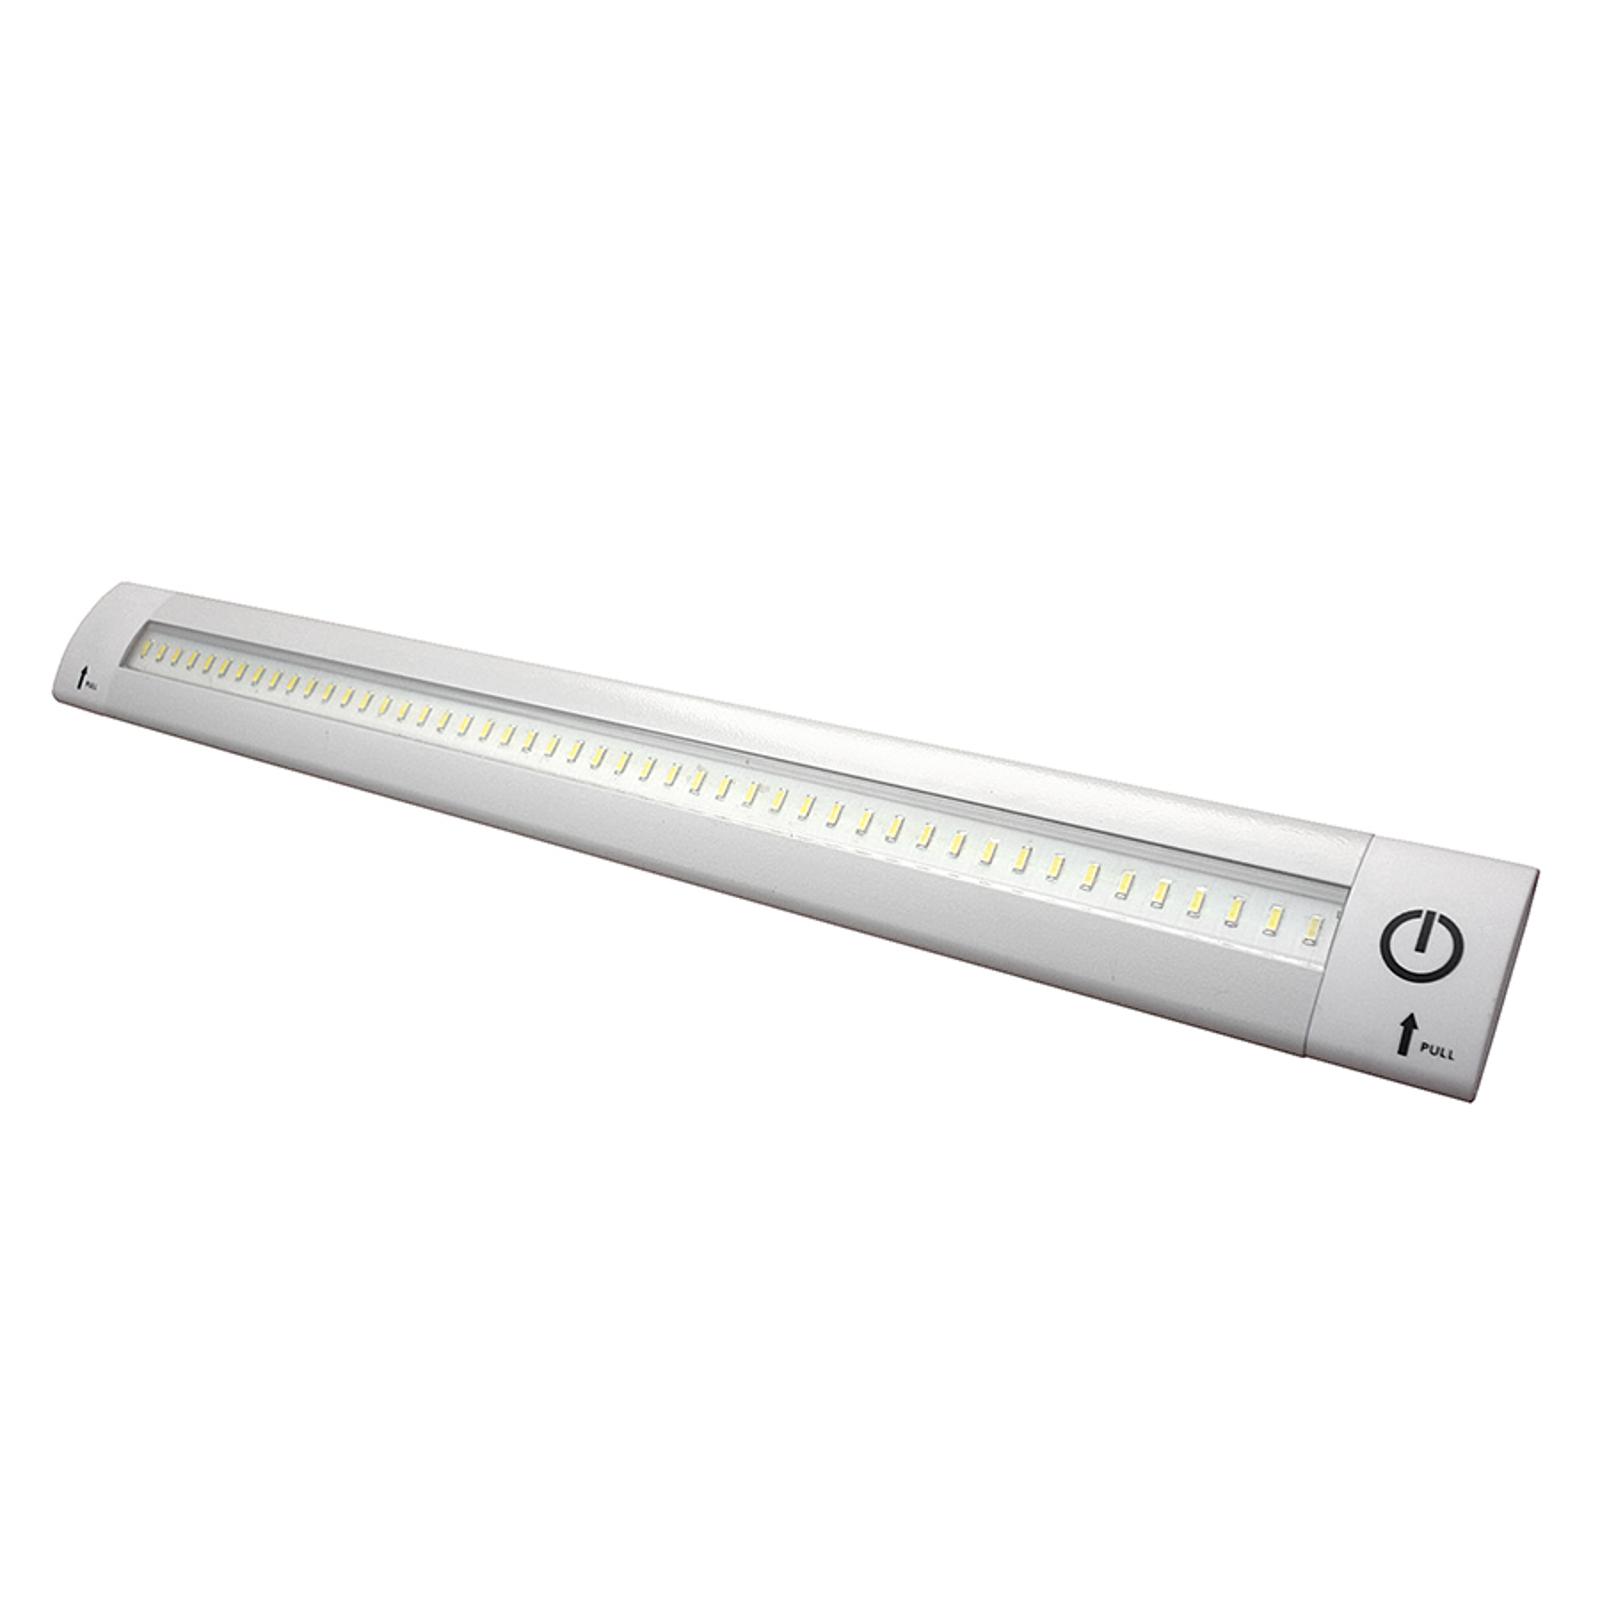 LED 5W møbelbelysning Galway 6690 TD dimbar